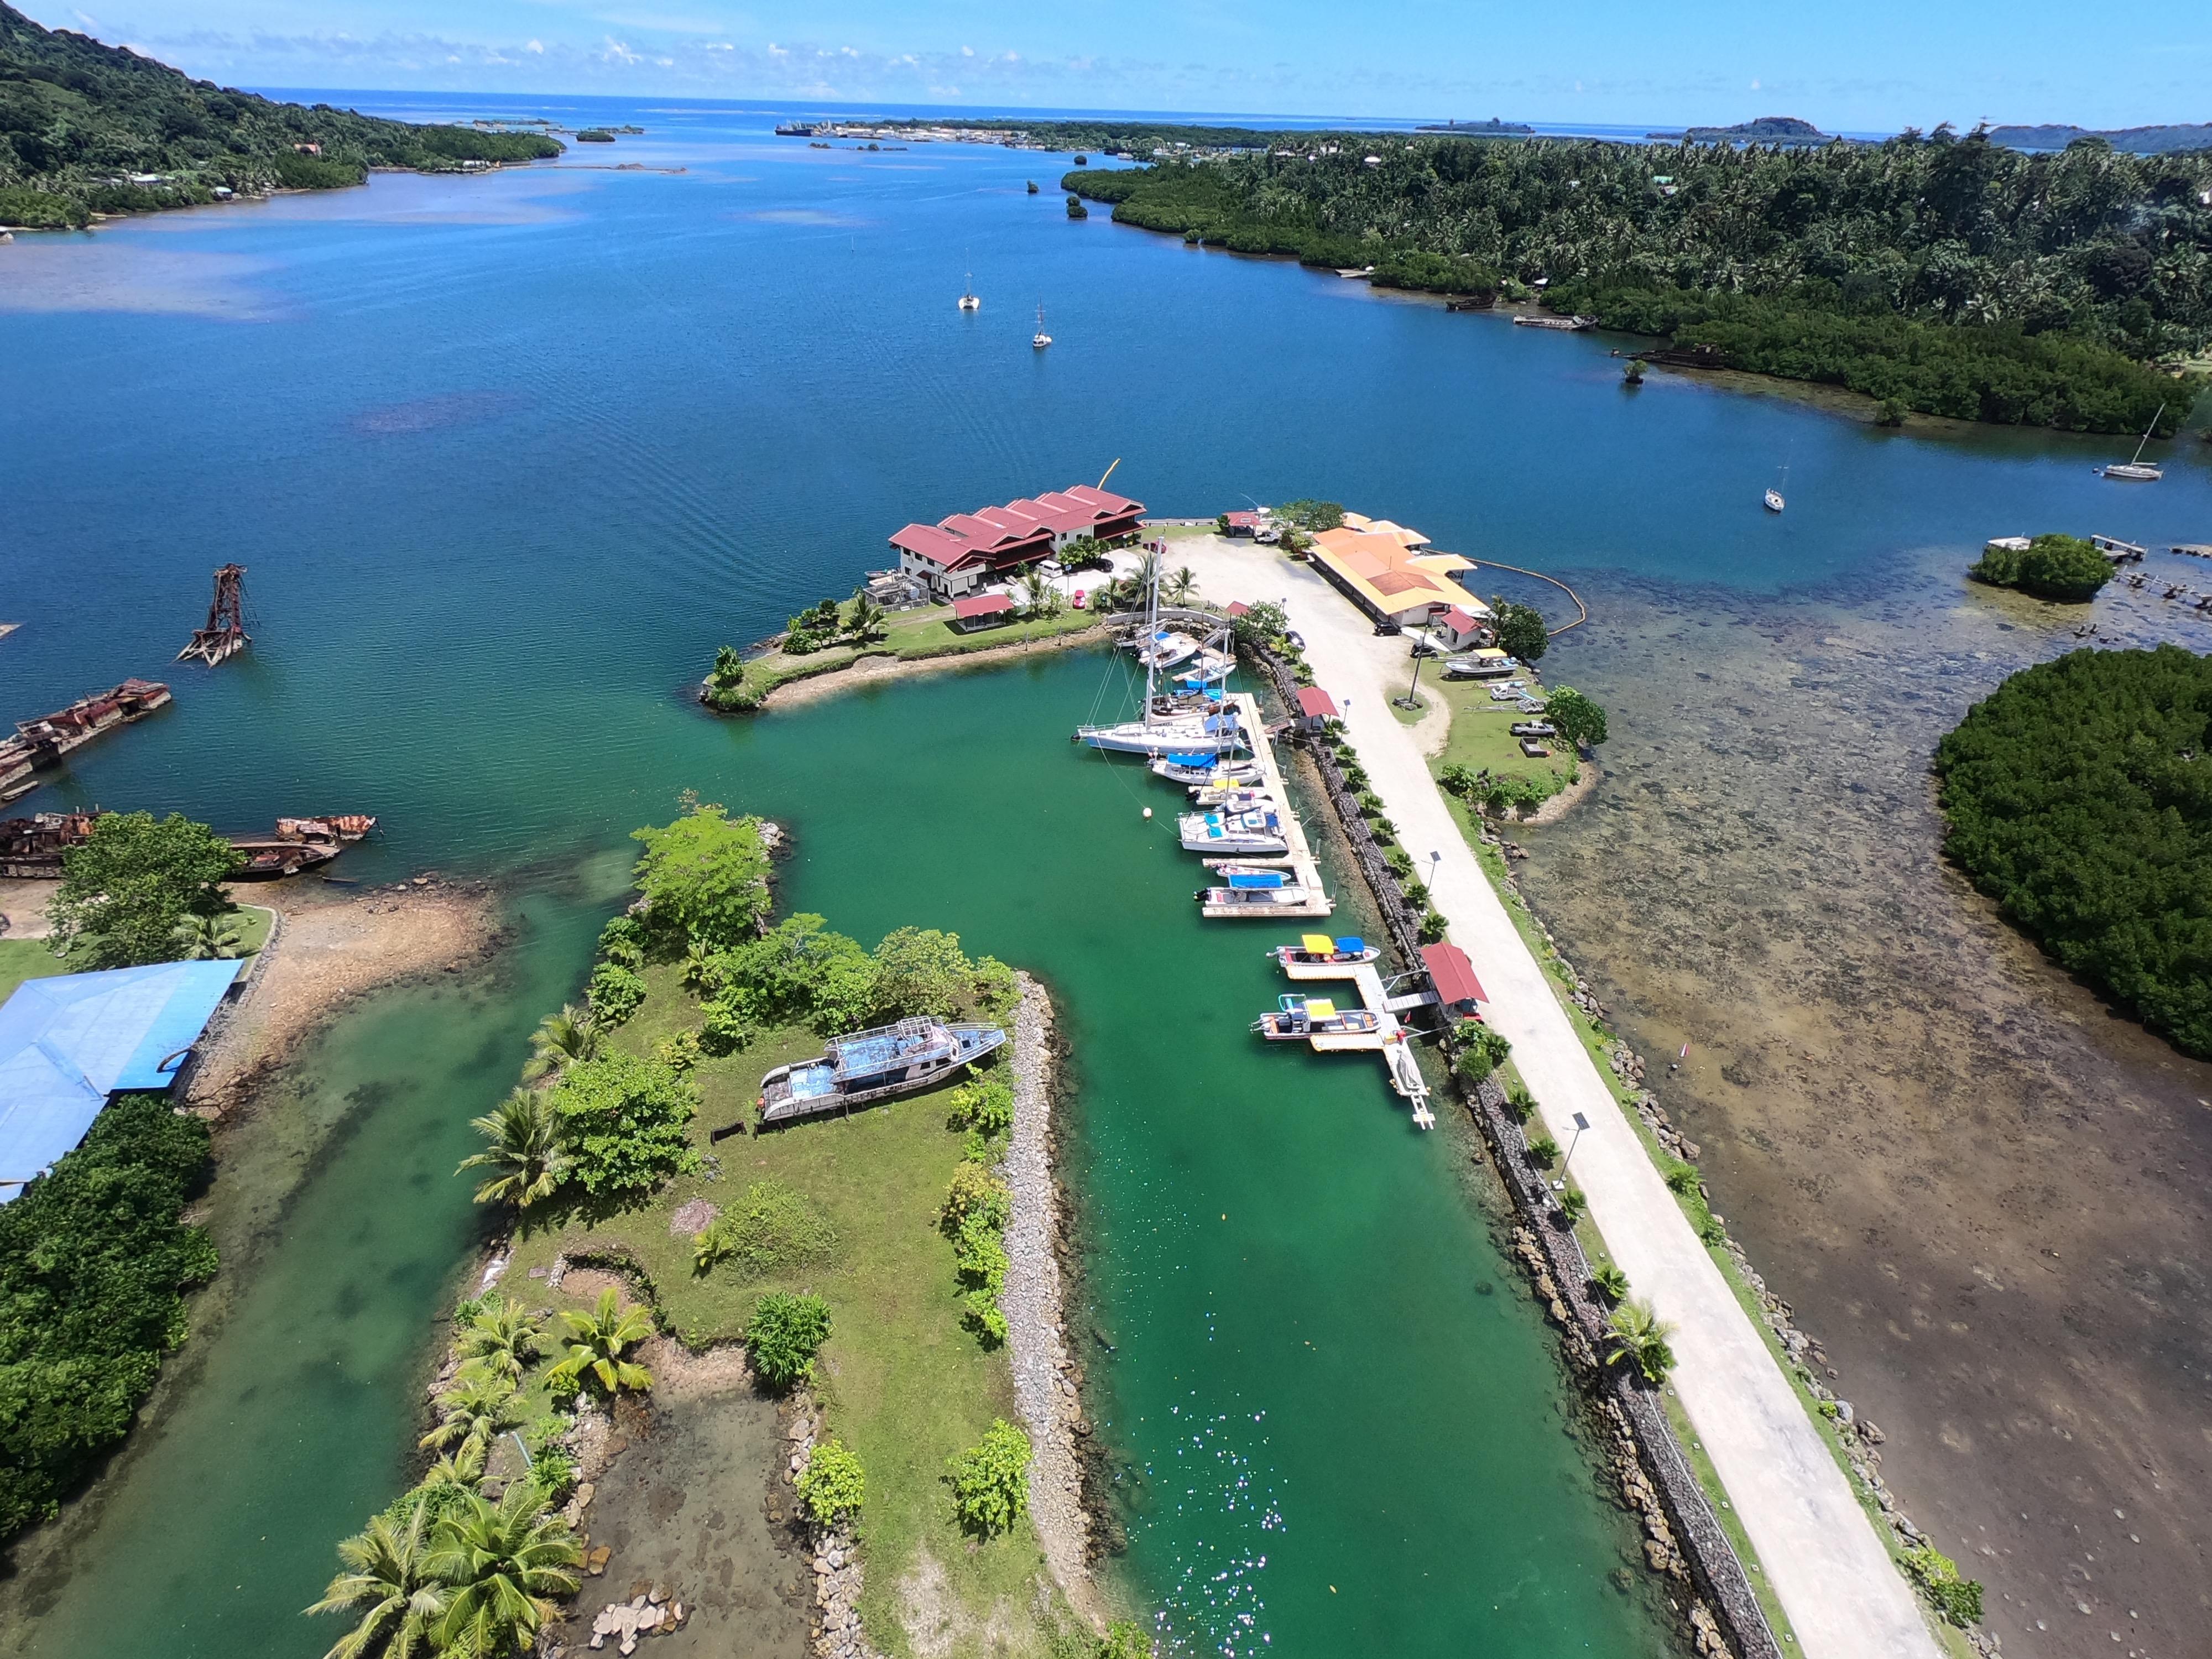 Mangrove Bay Hotel Yacht Docking offers